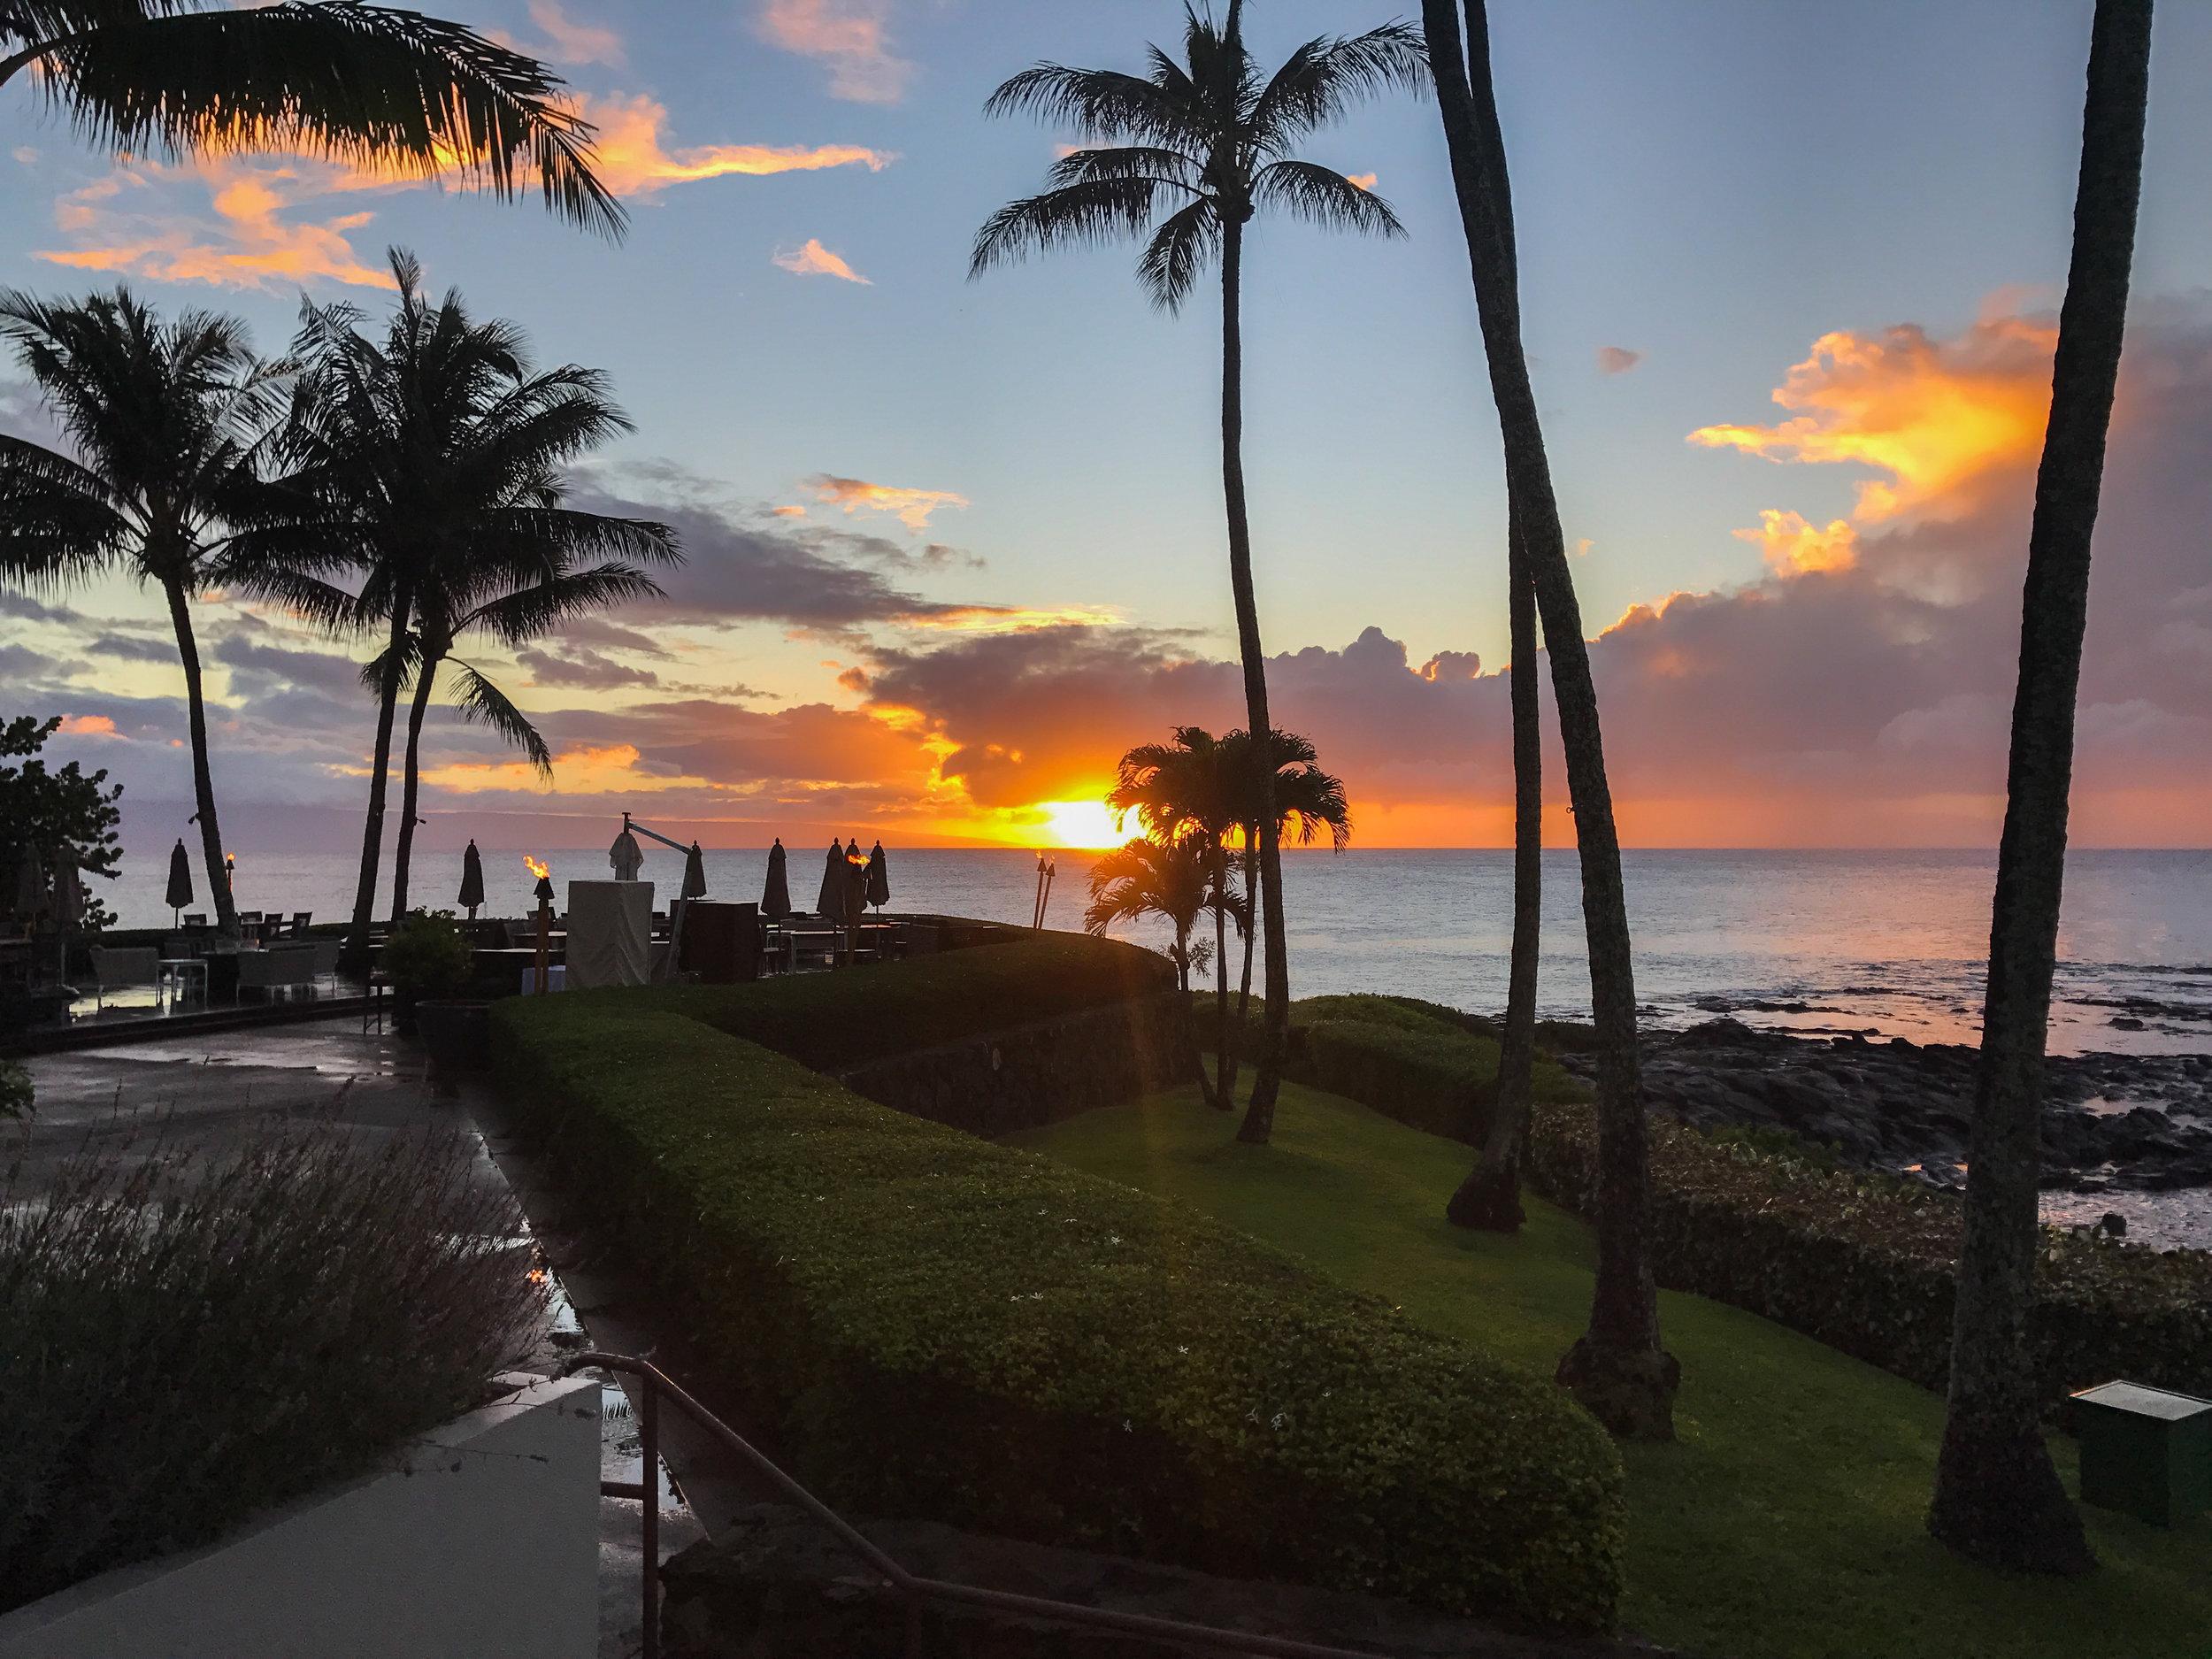 Maui_2016_2016-10-21 17.53.31.jpg